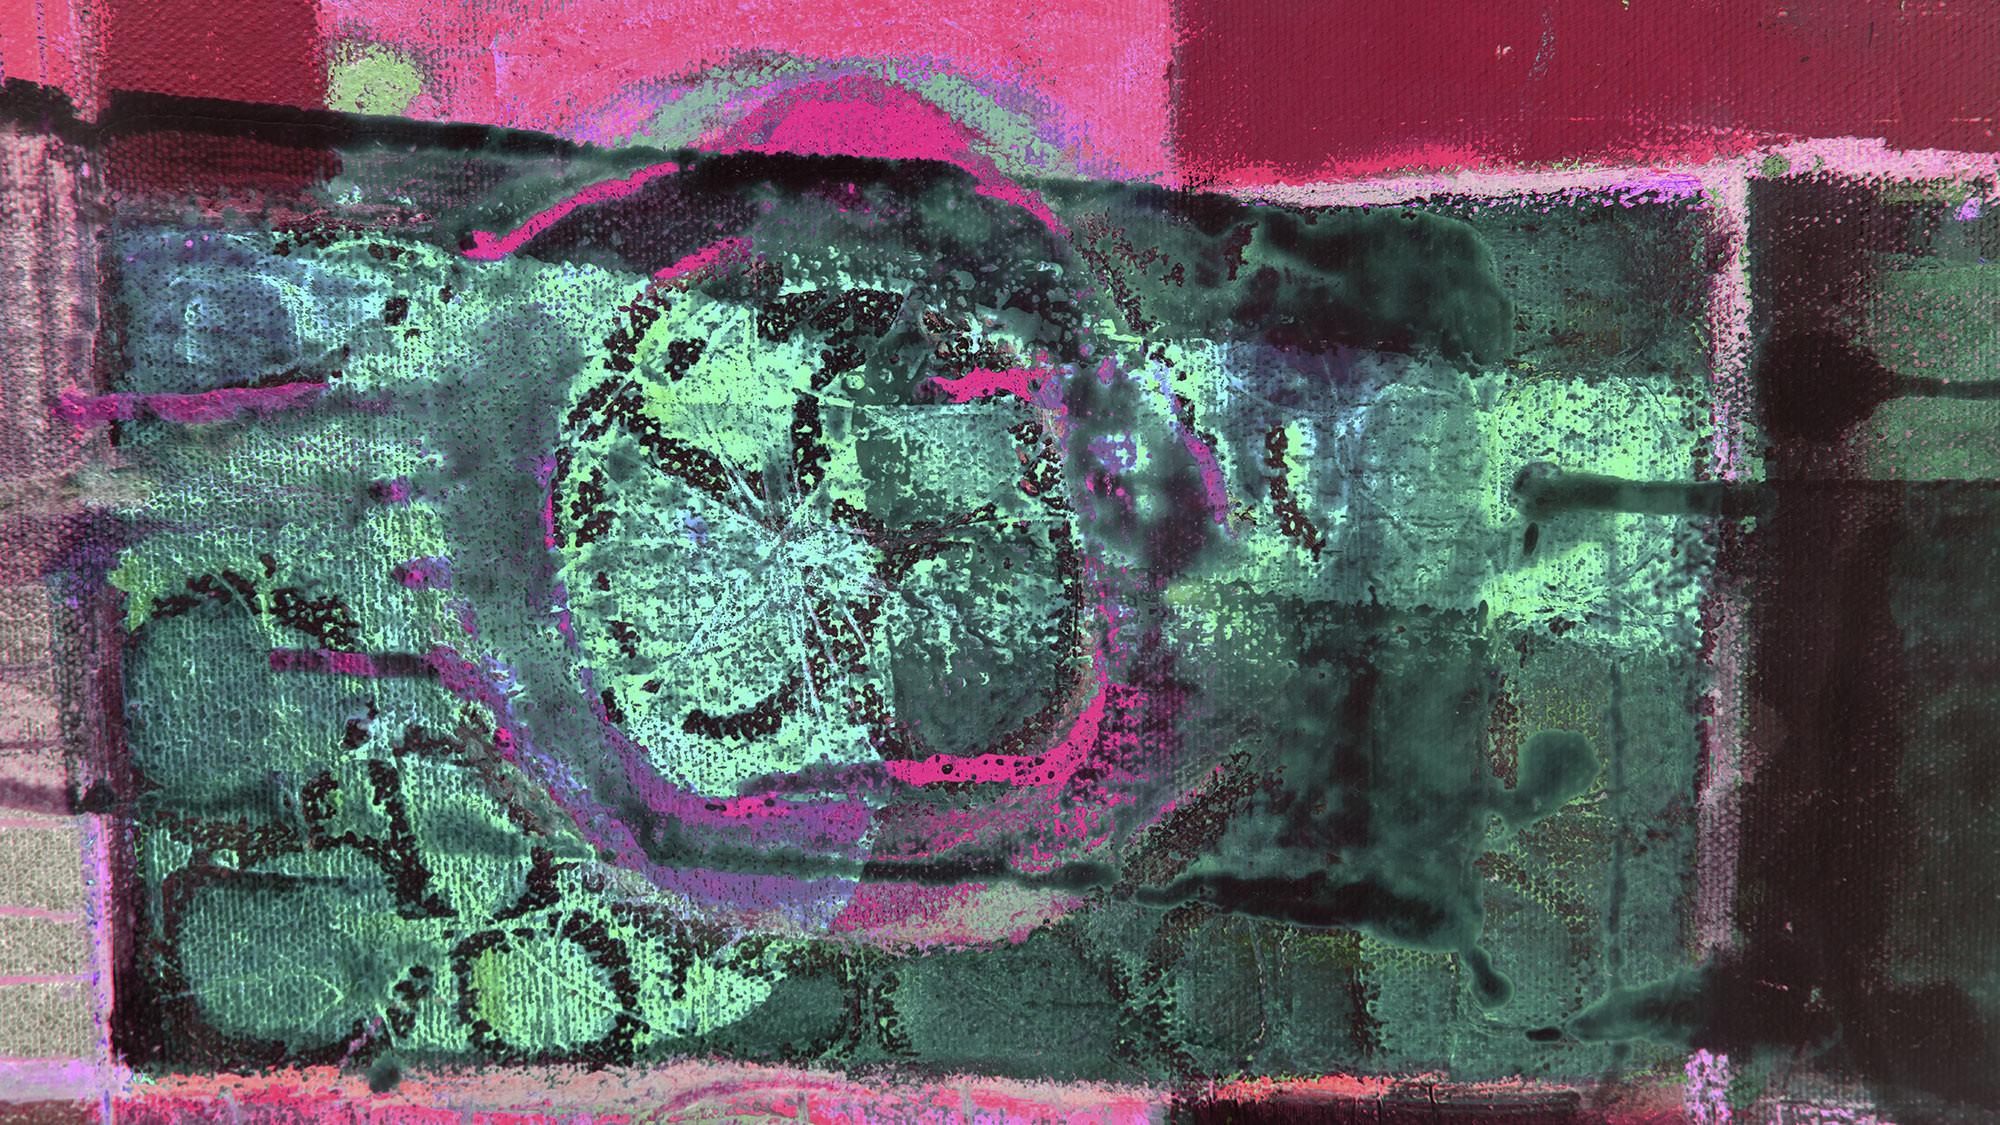 Lemon Peely green-pink